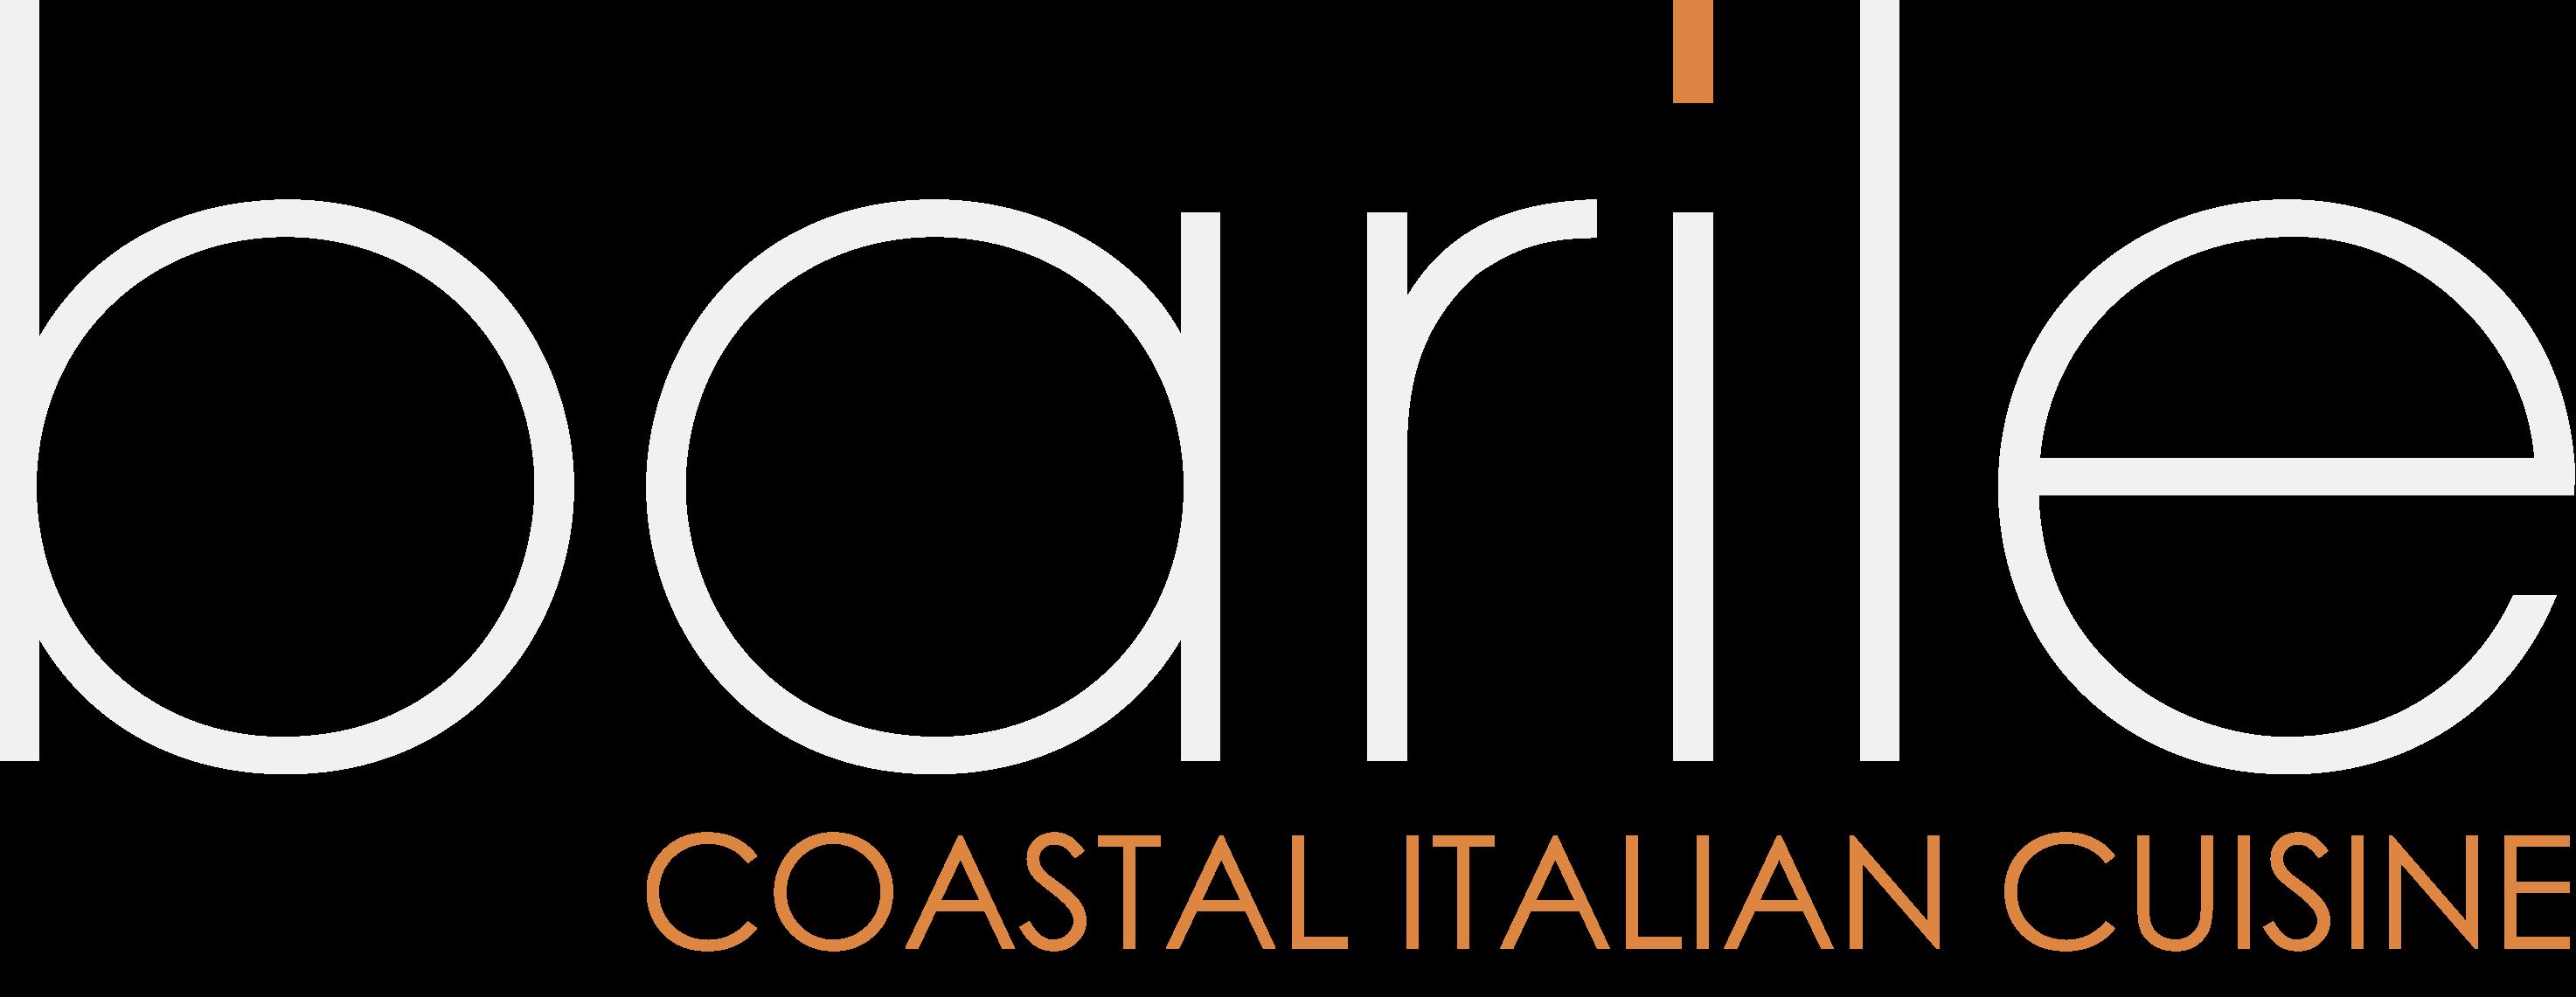 Barile Coastal Italian Restaurant